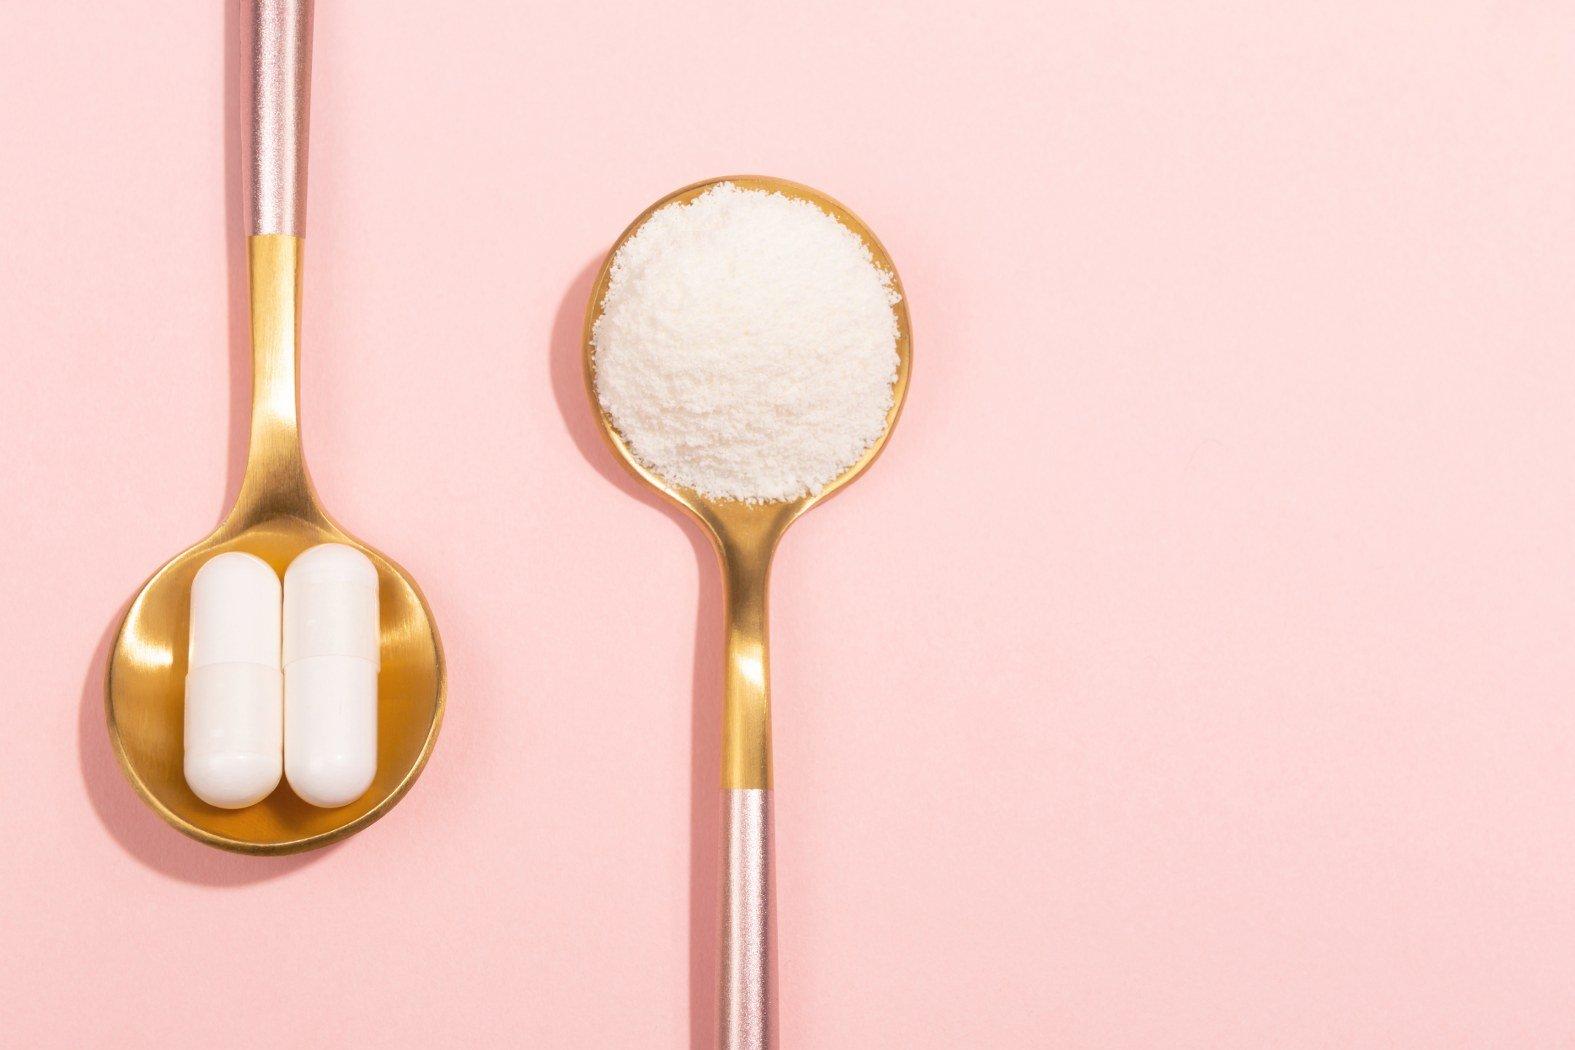 anti-aging supplement